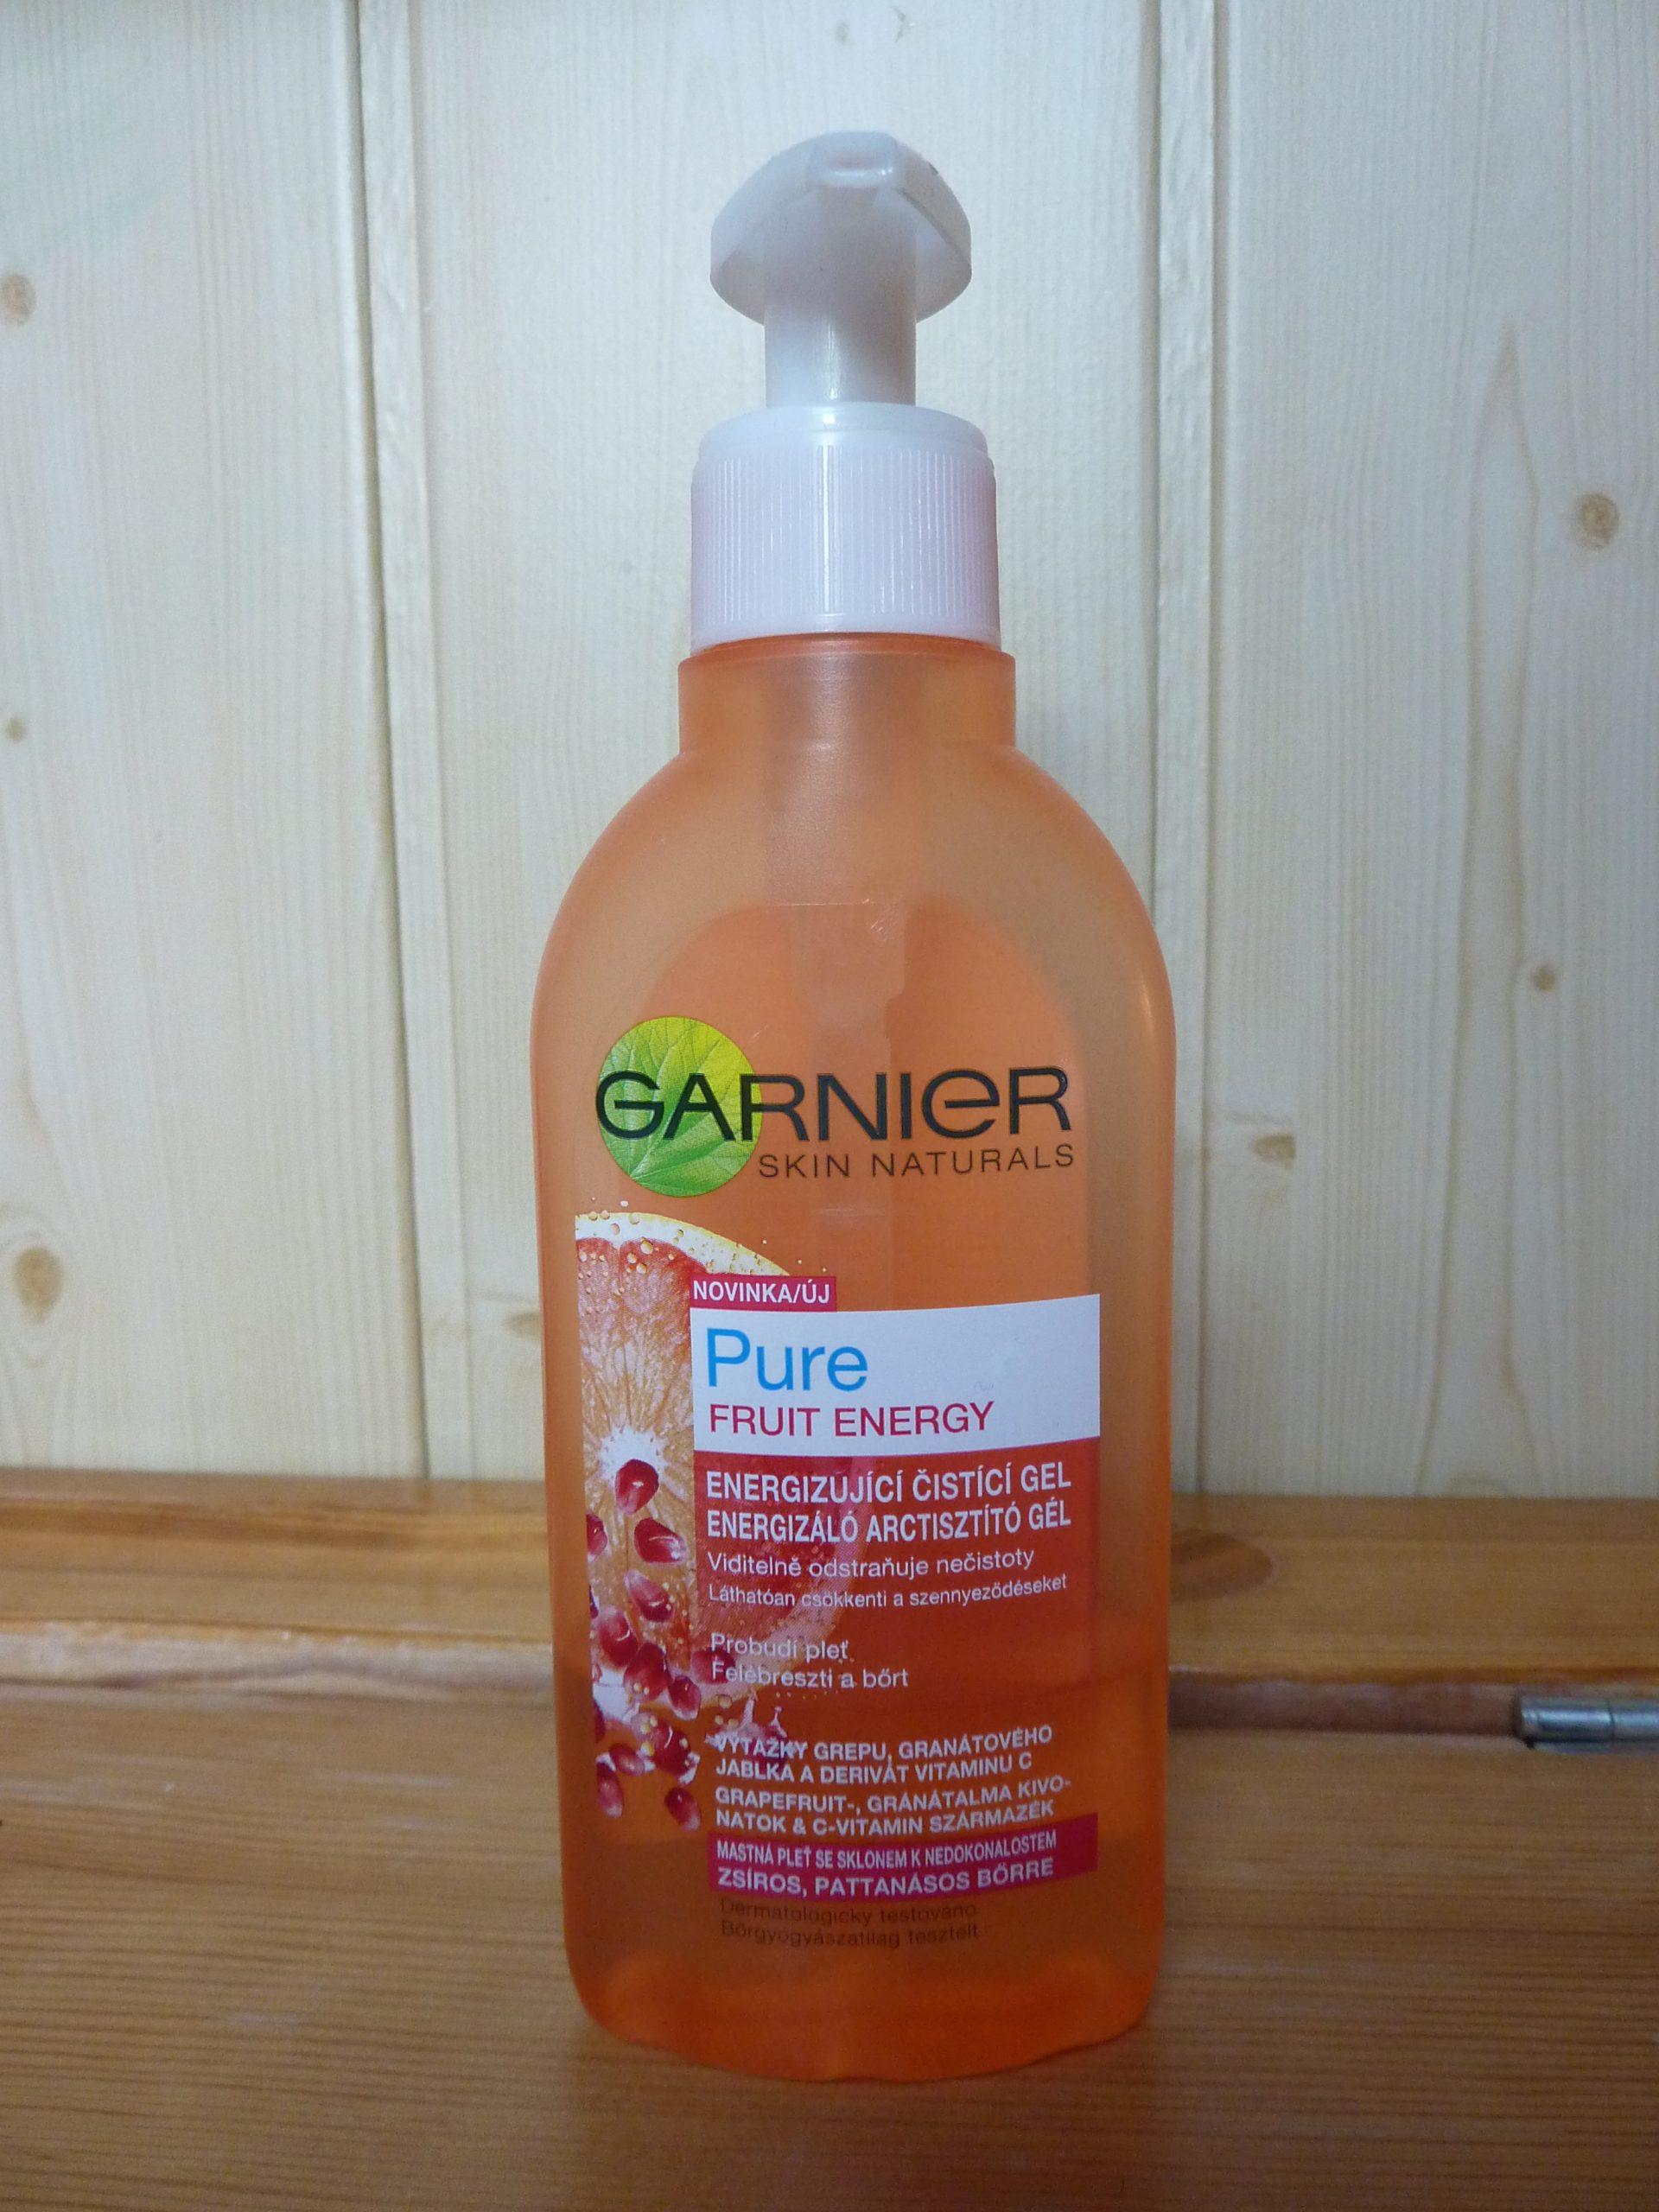 Čistící energizující gel Garnier Skin Naturals Pure Fruit Energy